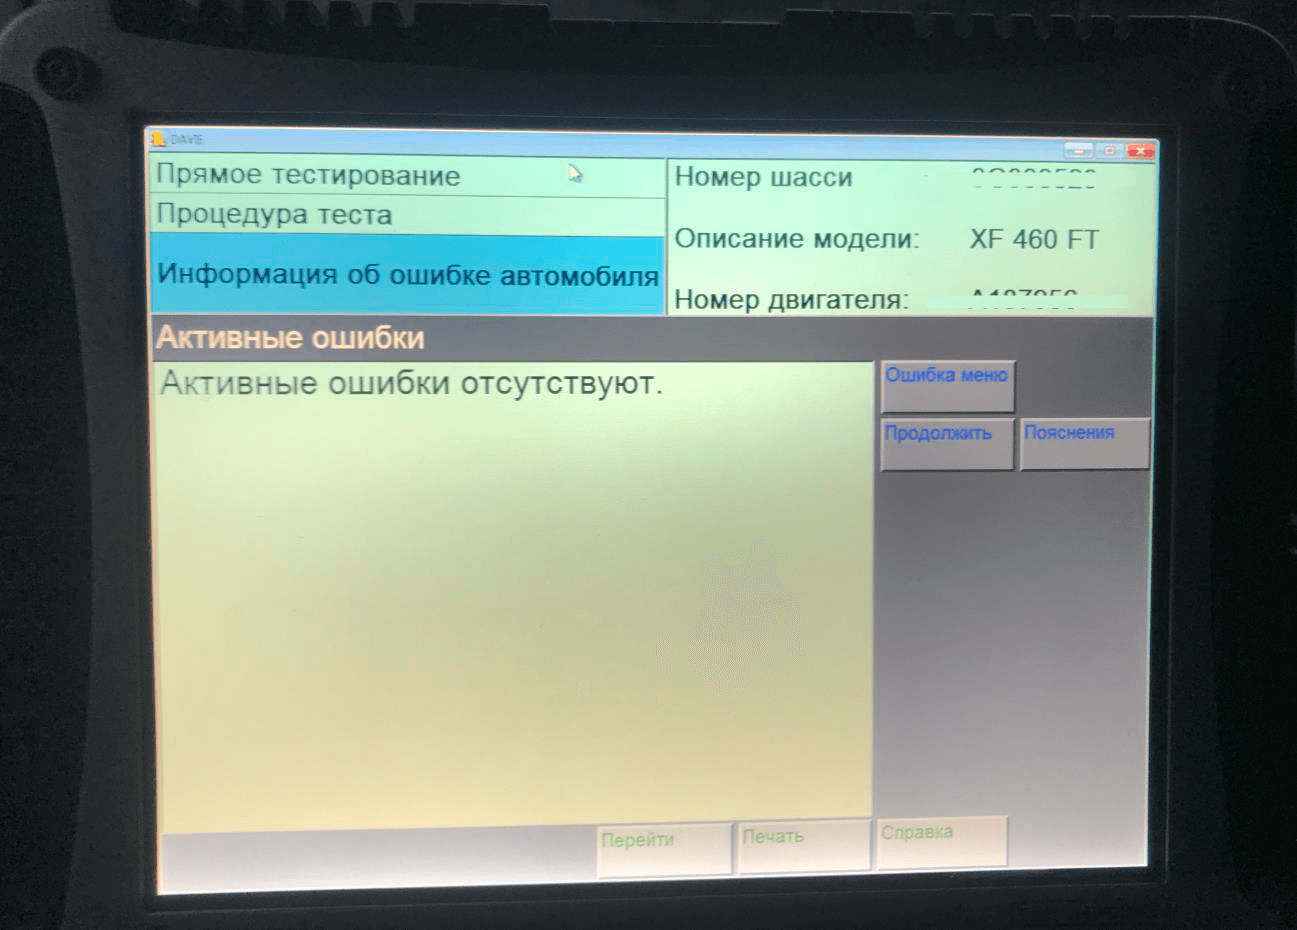 AdBlue Emulator EURO 6 NOx installation manual for DAF trucks DTC